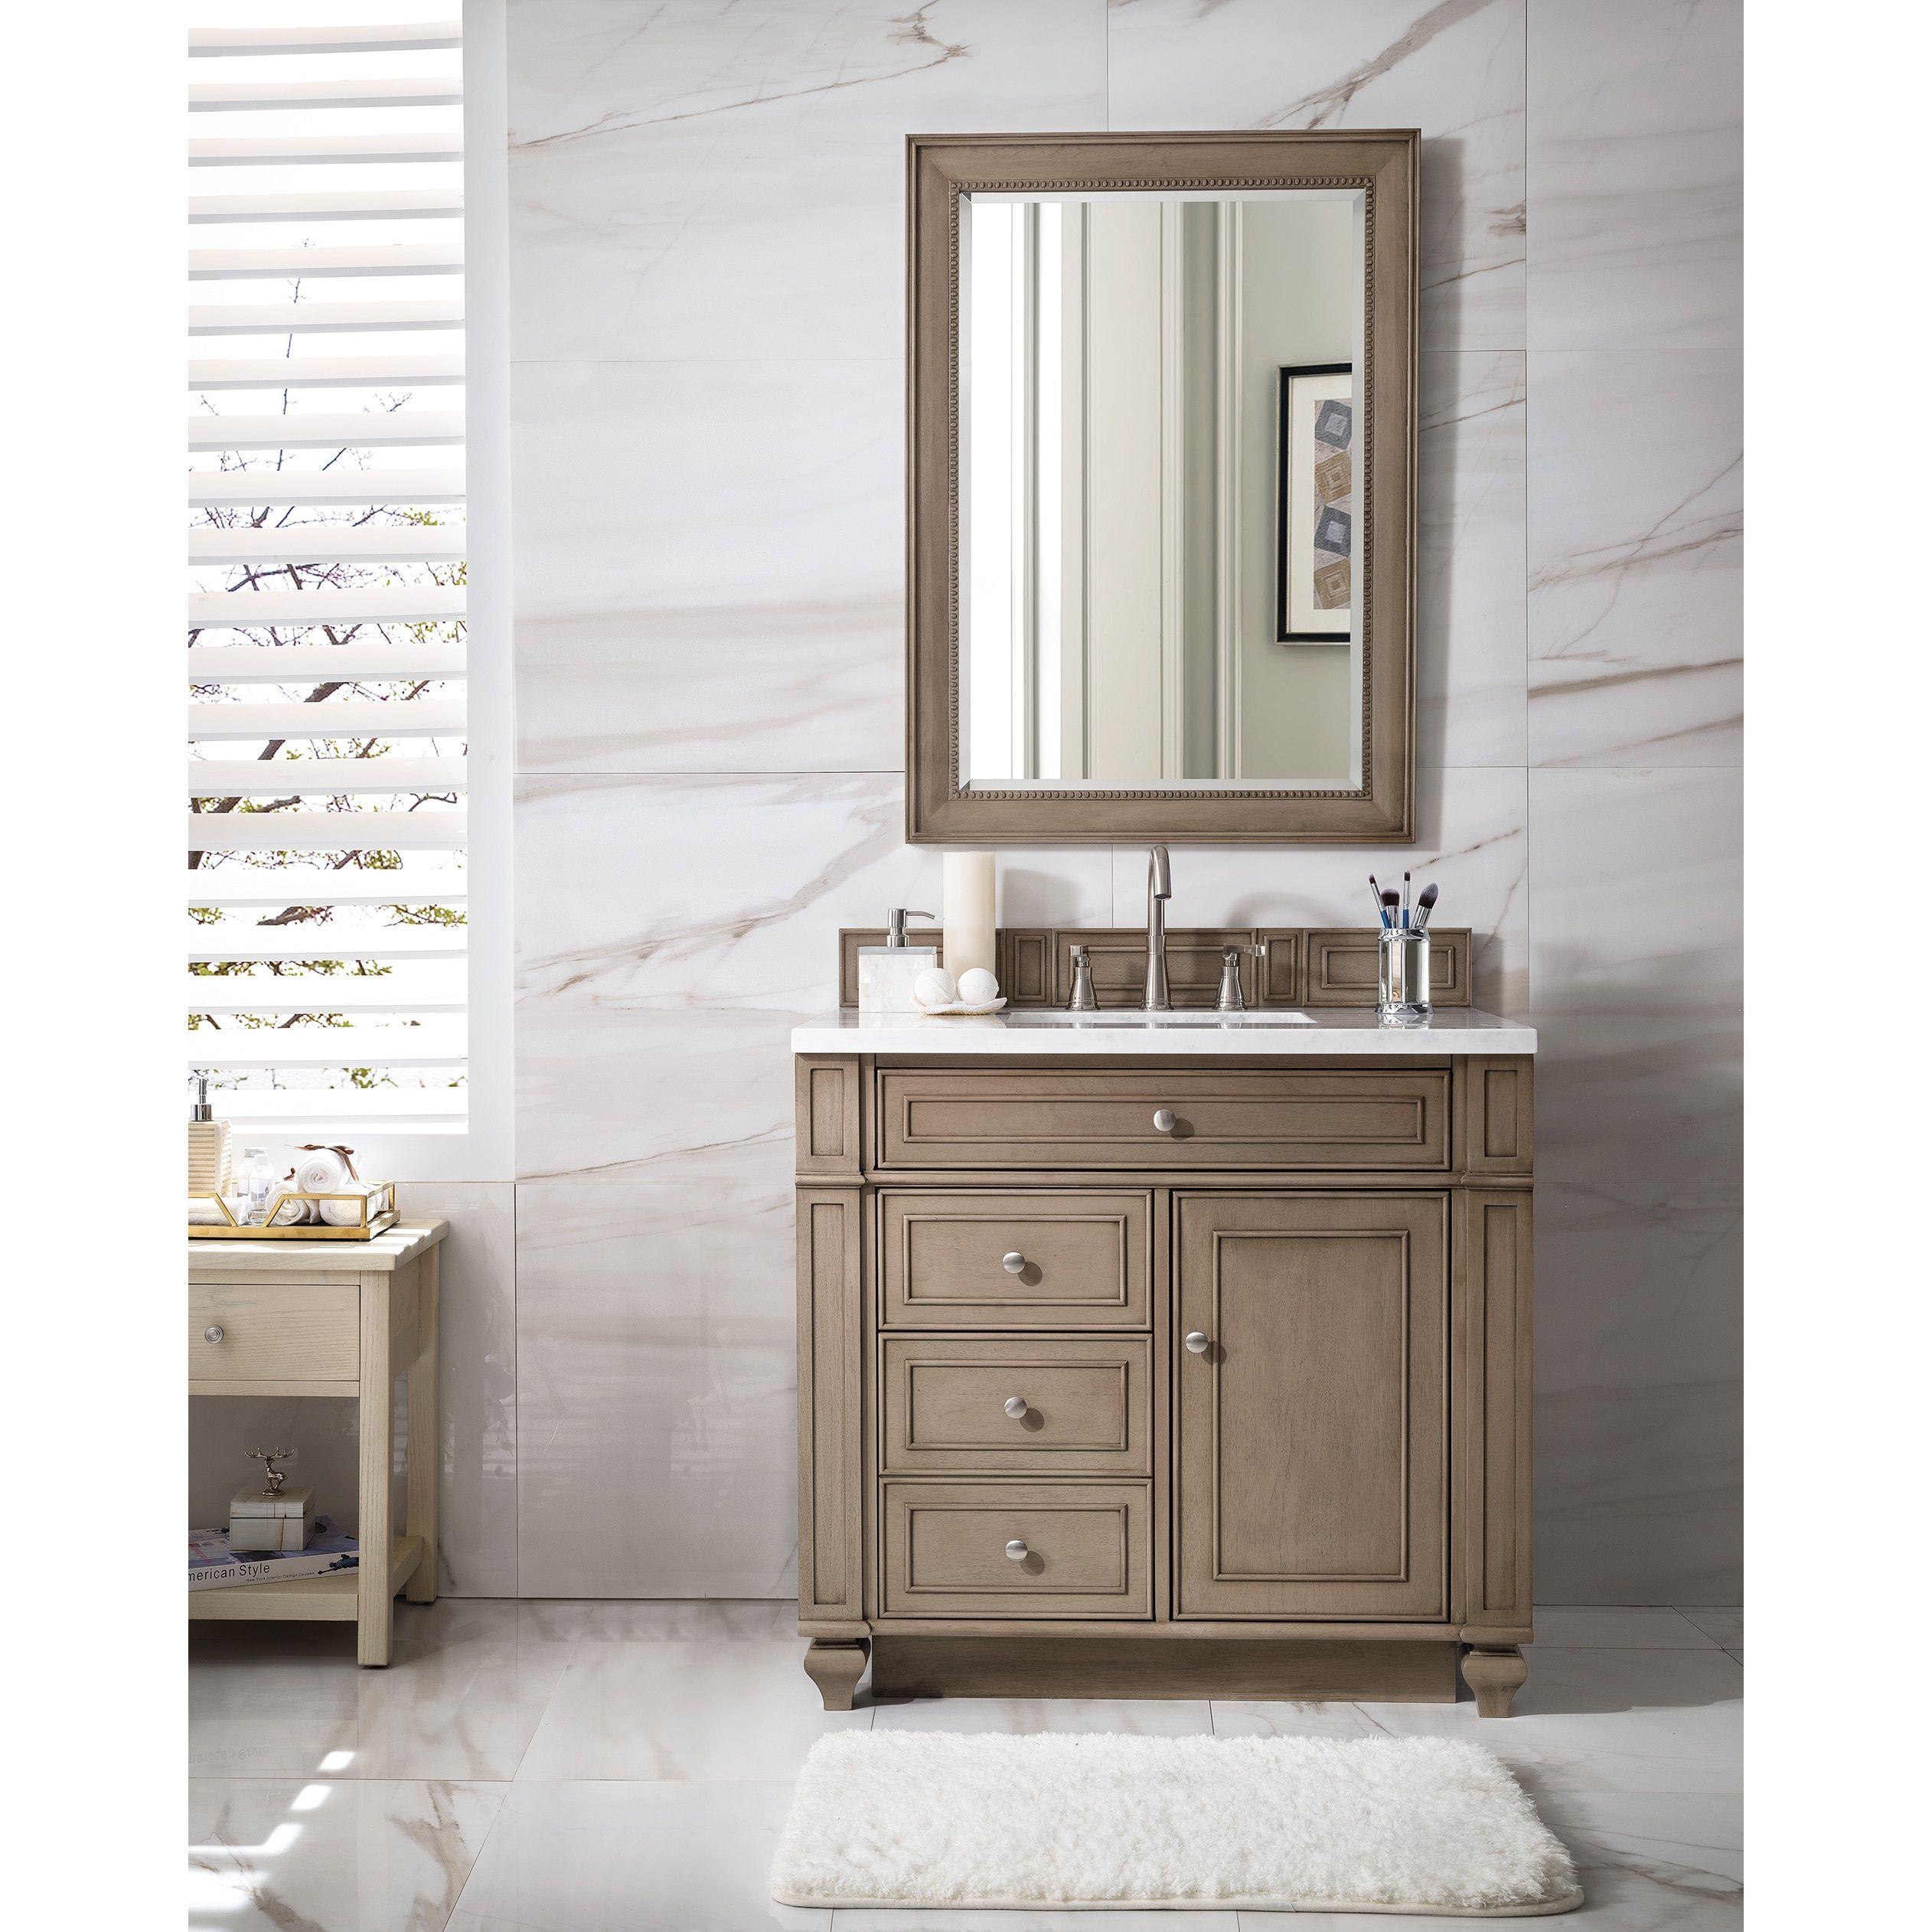 James Martin Furniture Bristol 36 Single Vanity White Washed Walnut Brown Base Only No Top N A